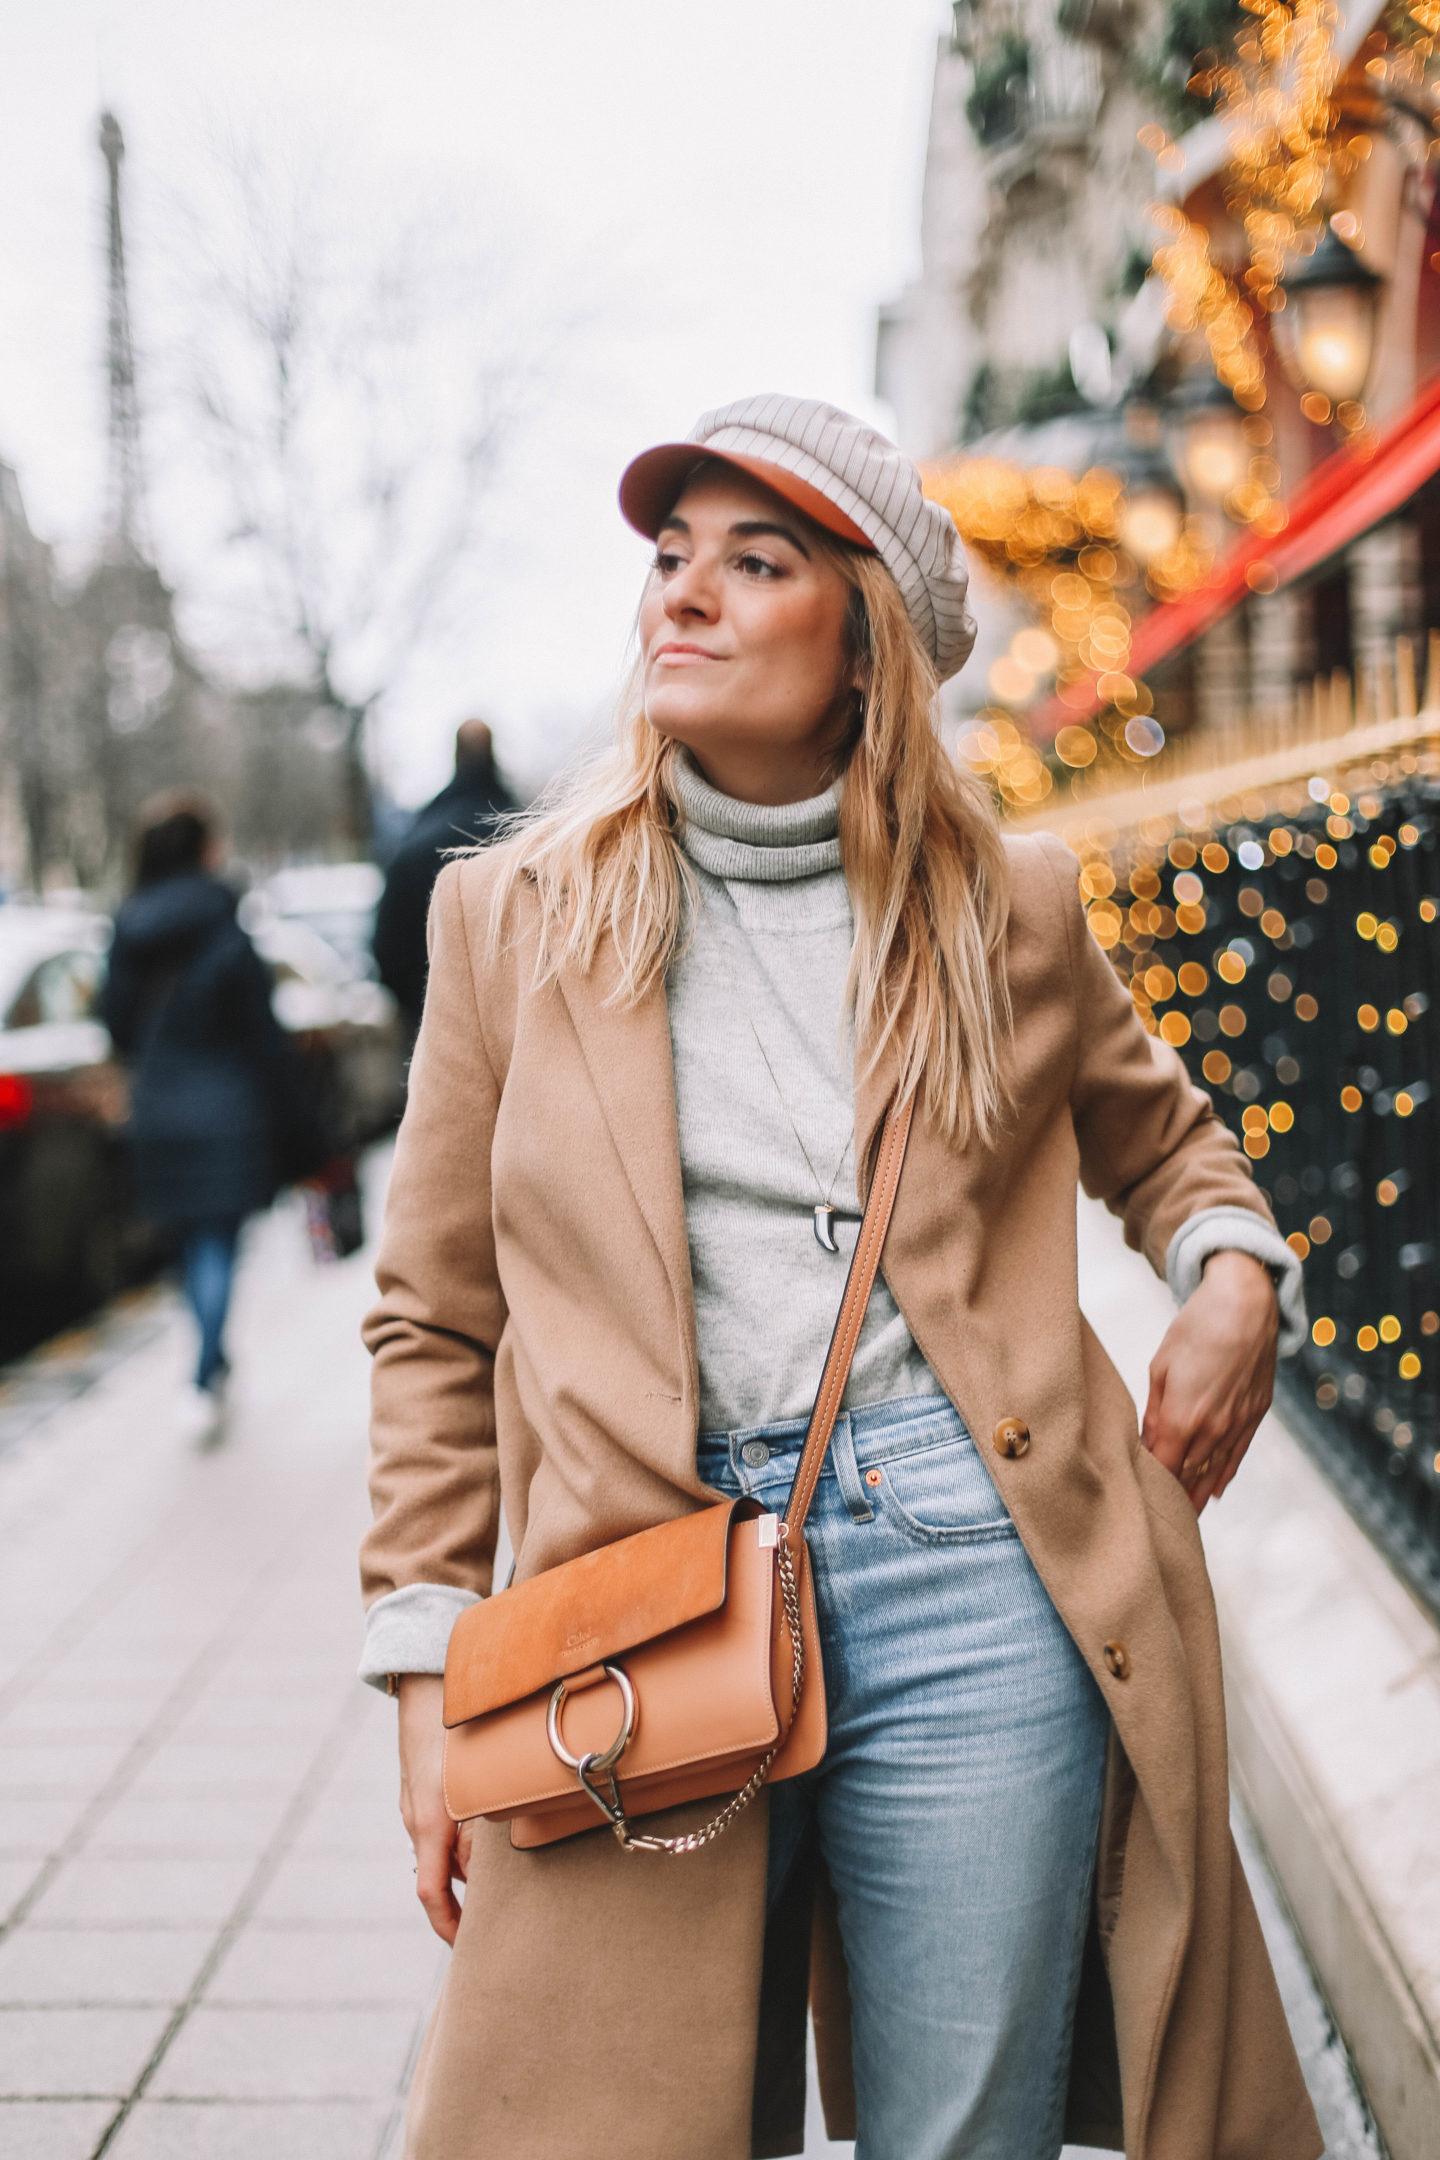 Manteau Camel - Blondie Baby blog mode et voyages